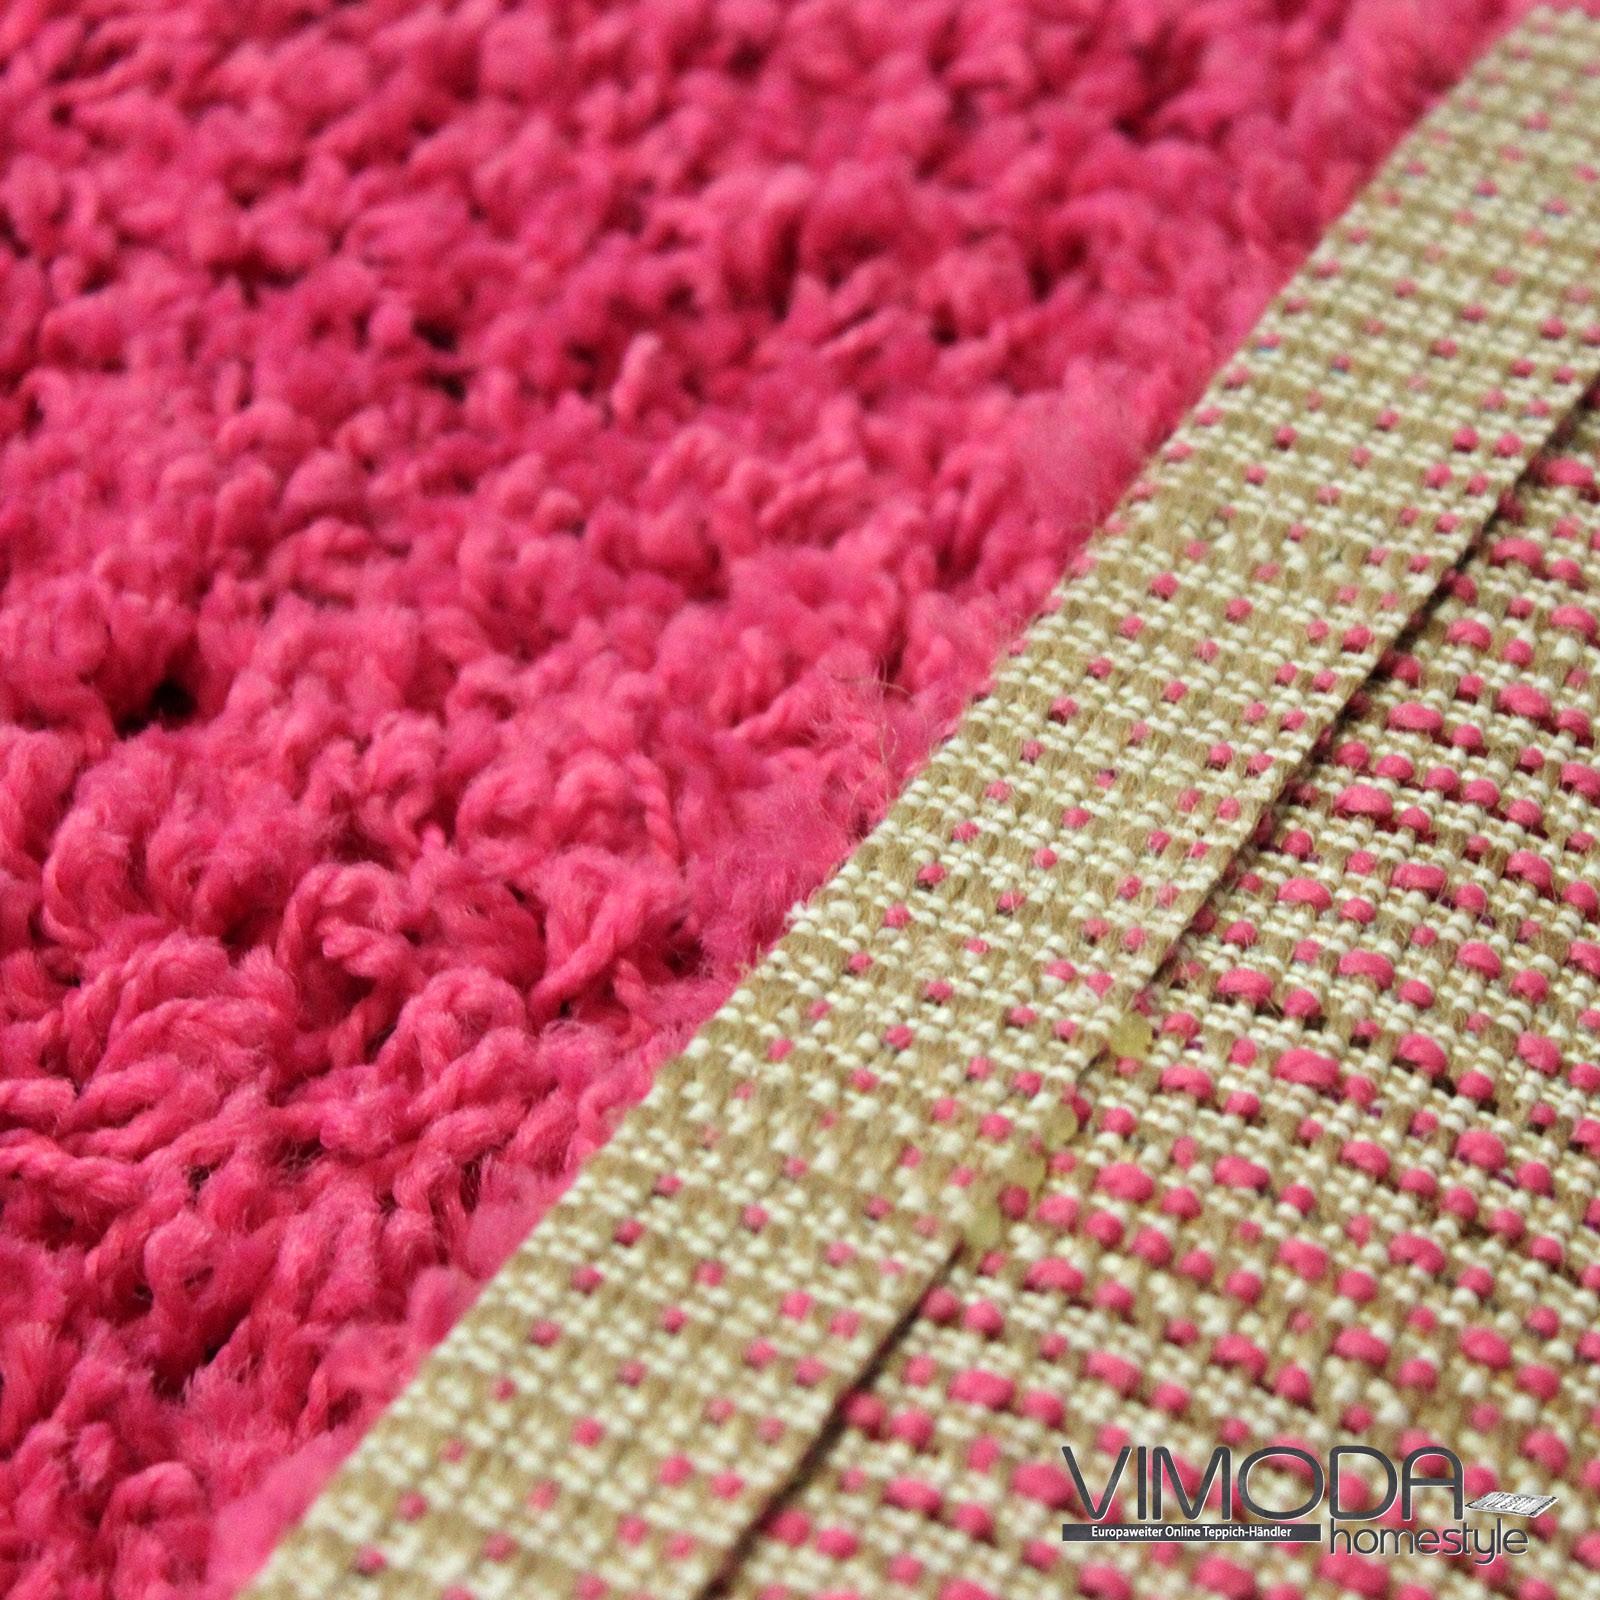 moderner hochflor shaggy teppich farbe pink versch gr en neu blitzversand ebay. Black Bedroom Furniture Sets. Home Design Ideas